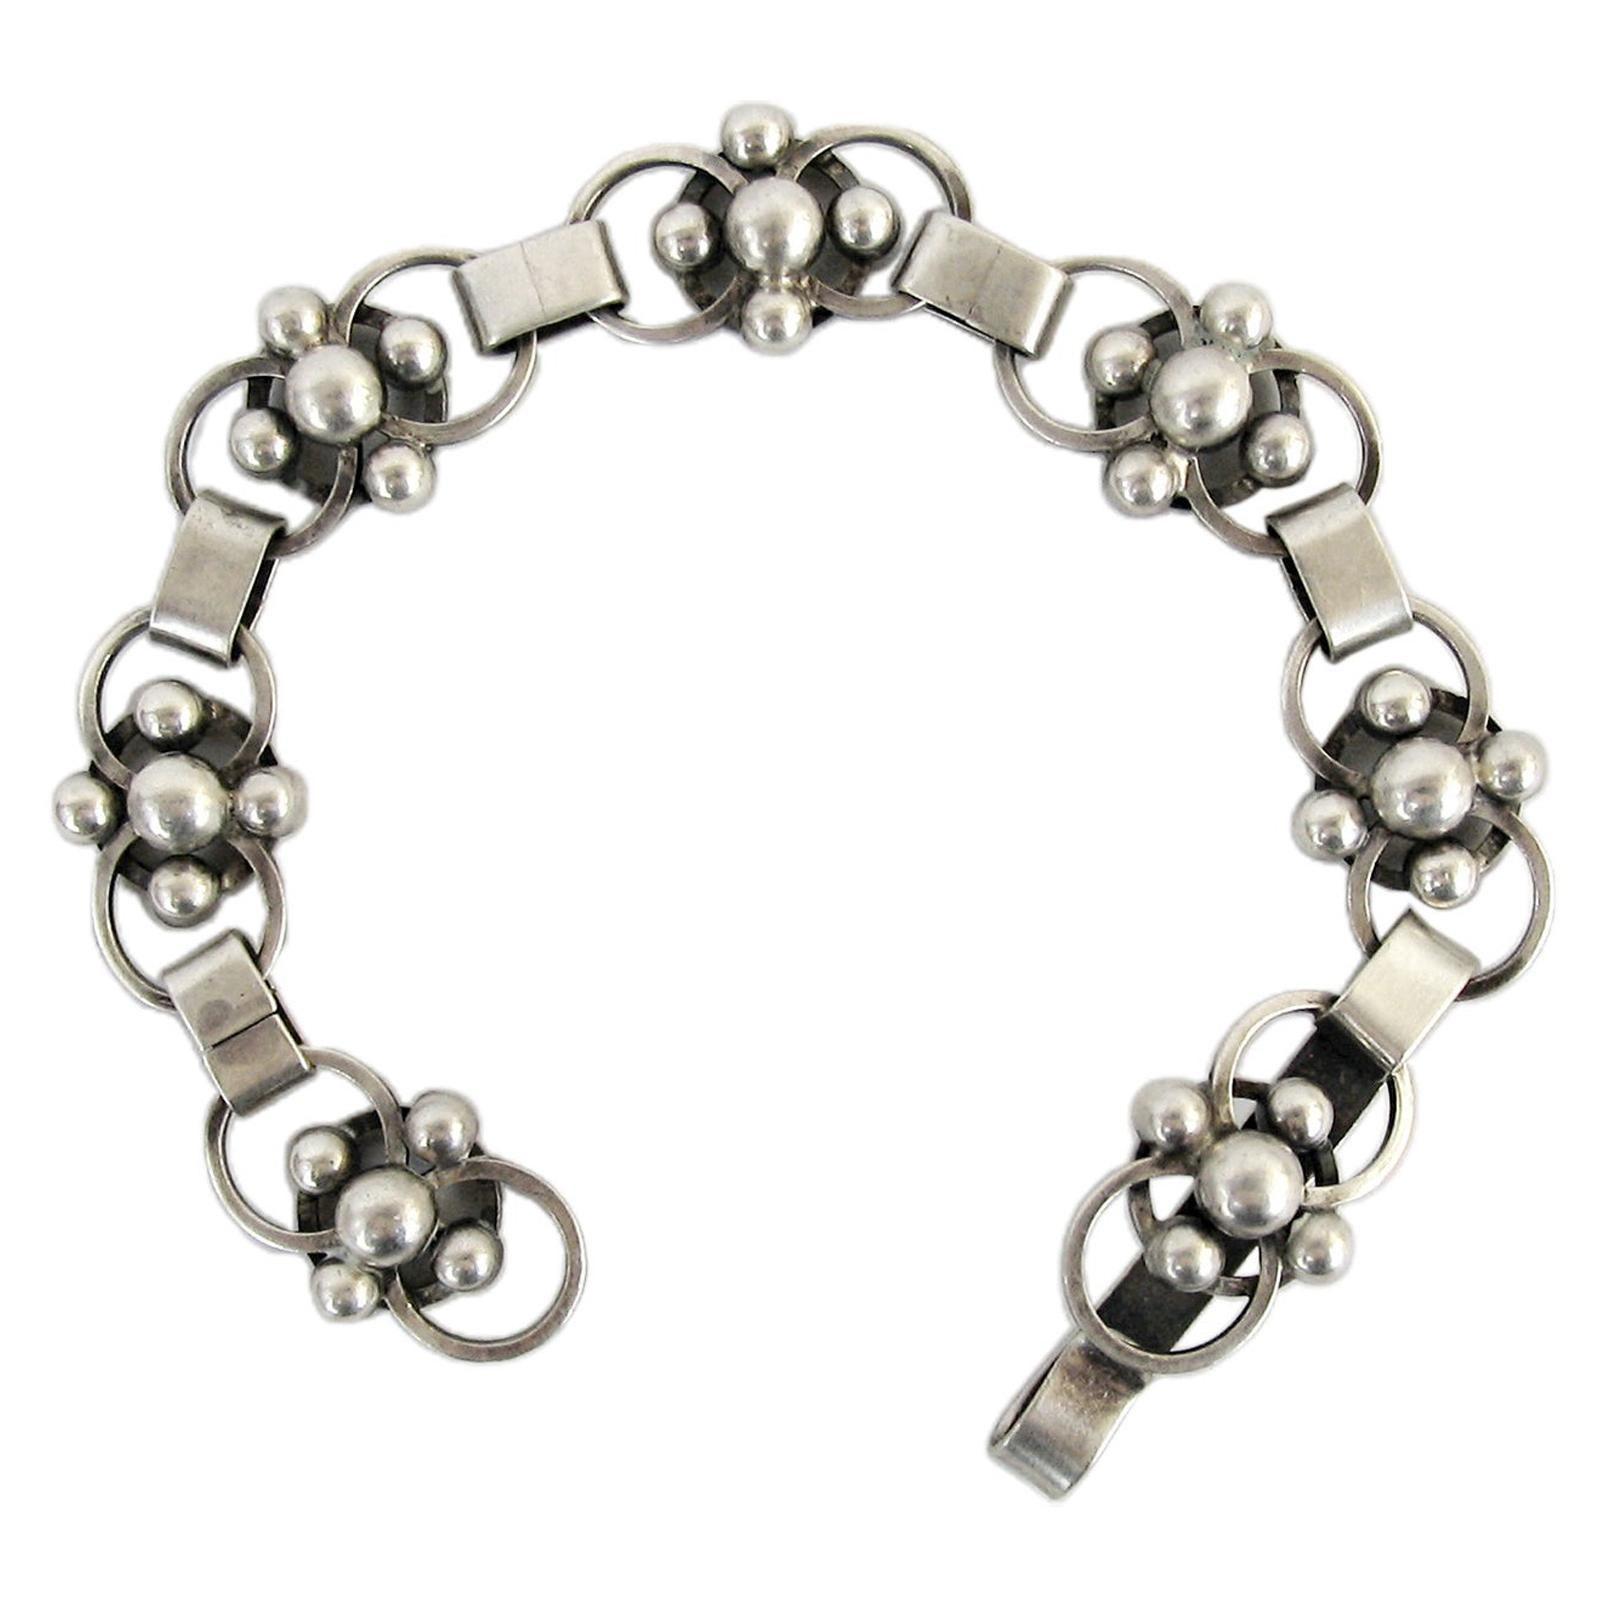 Mid-century Scandinavian Silver Bracelet by Sven Erik Högberg, 1952